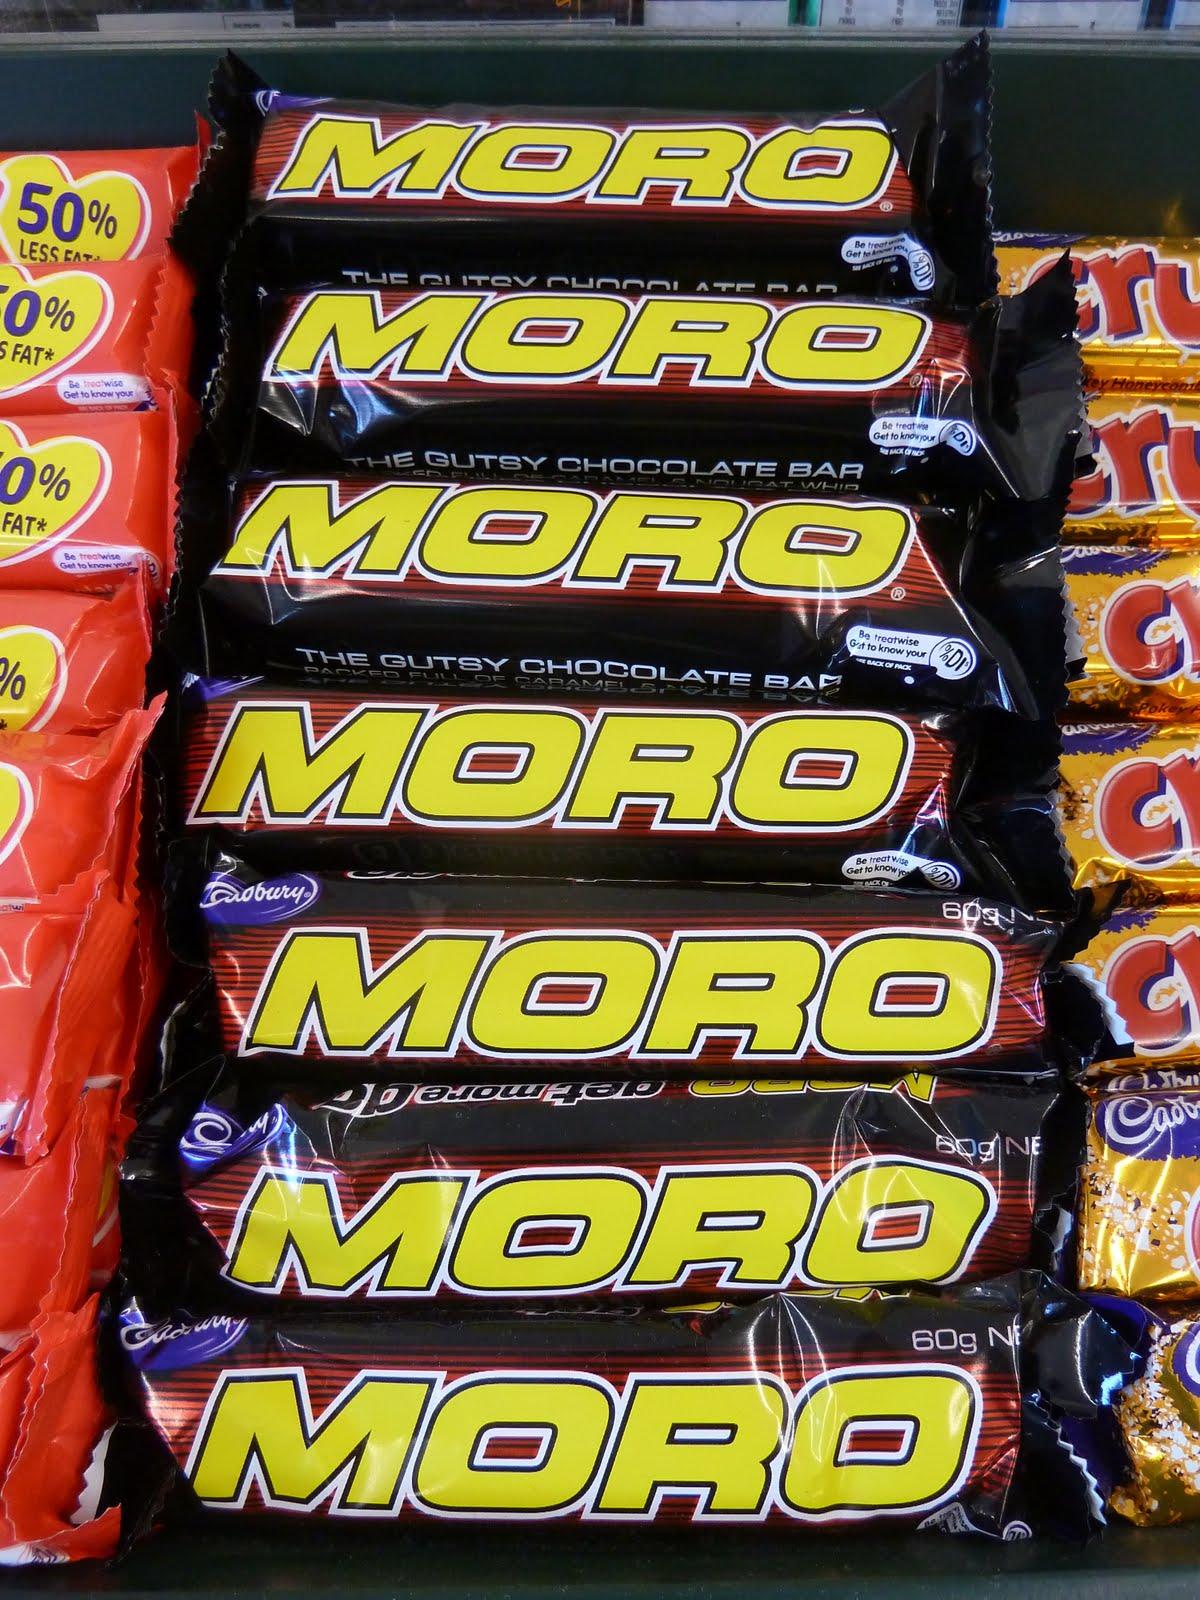 Moro bar